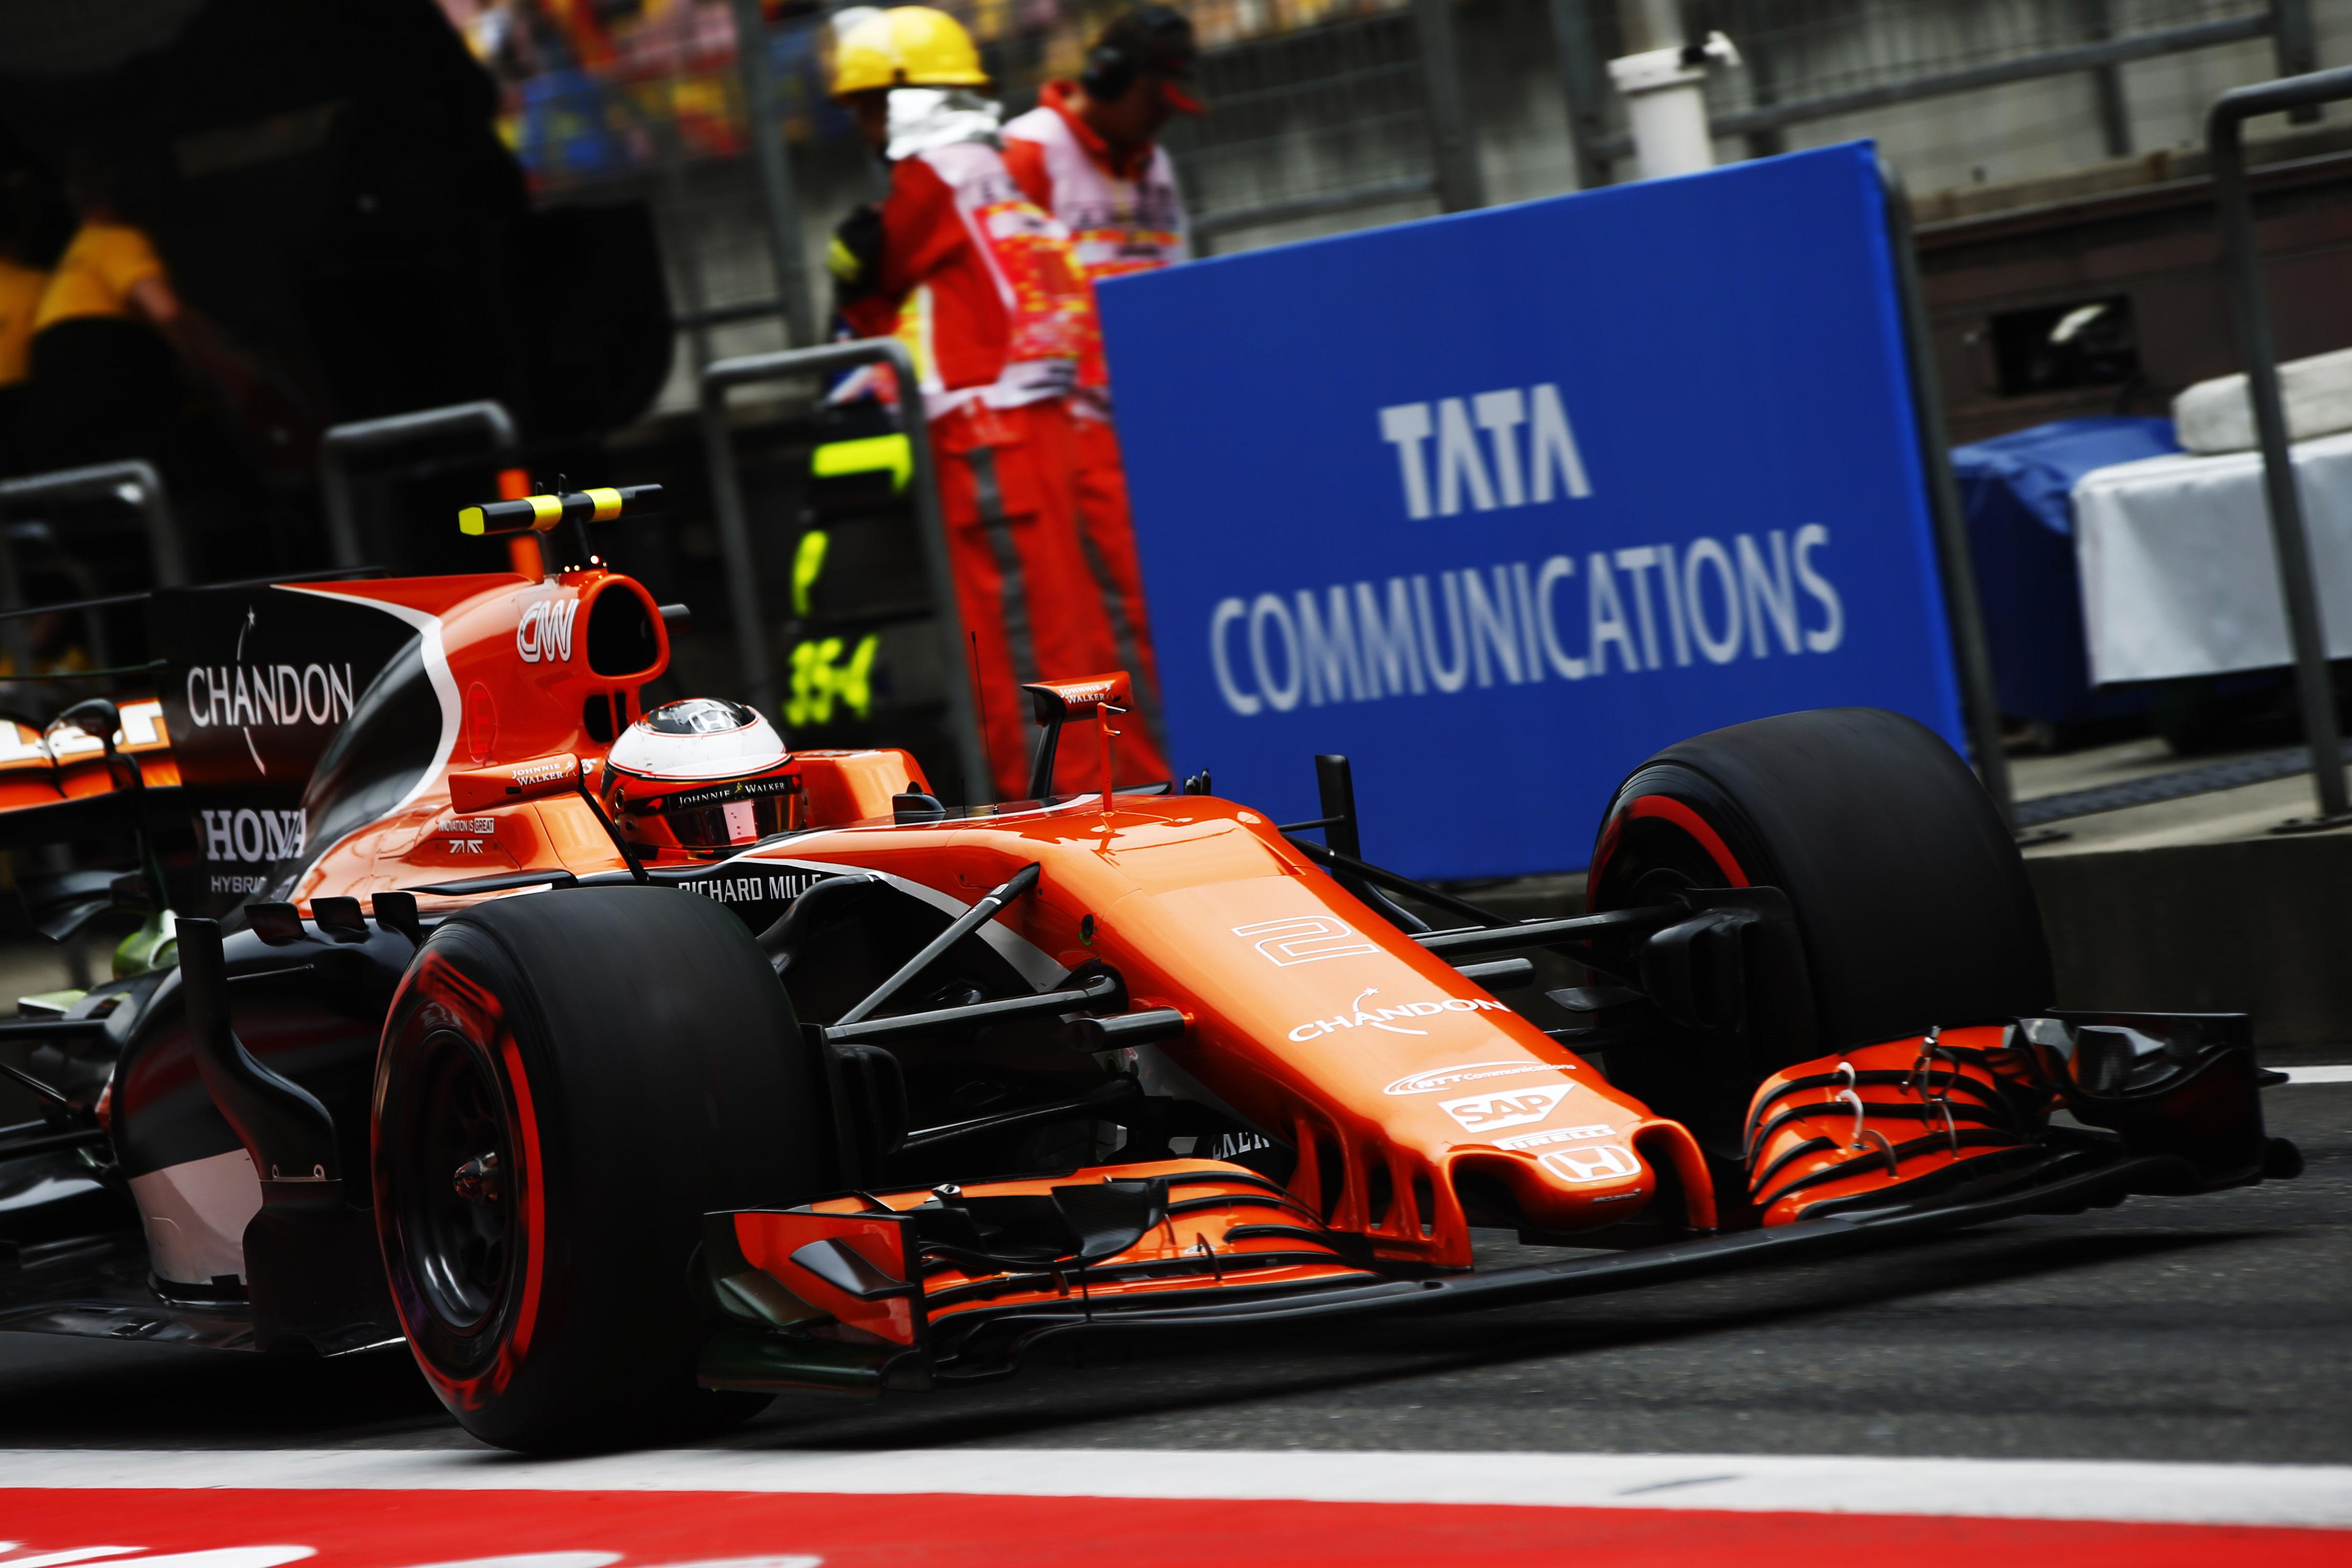 F1 Formula 1 Tata Communications marketing partnership